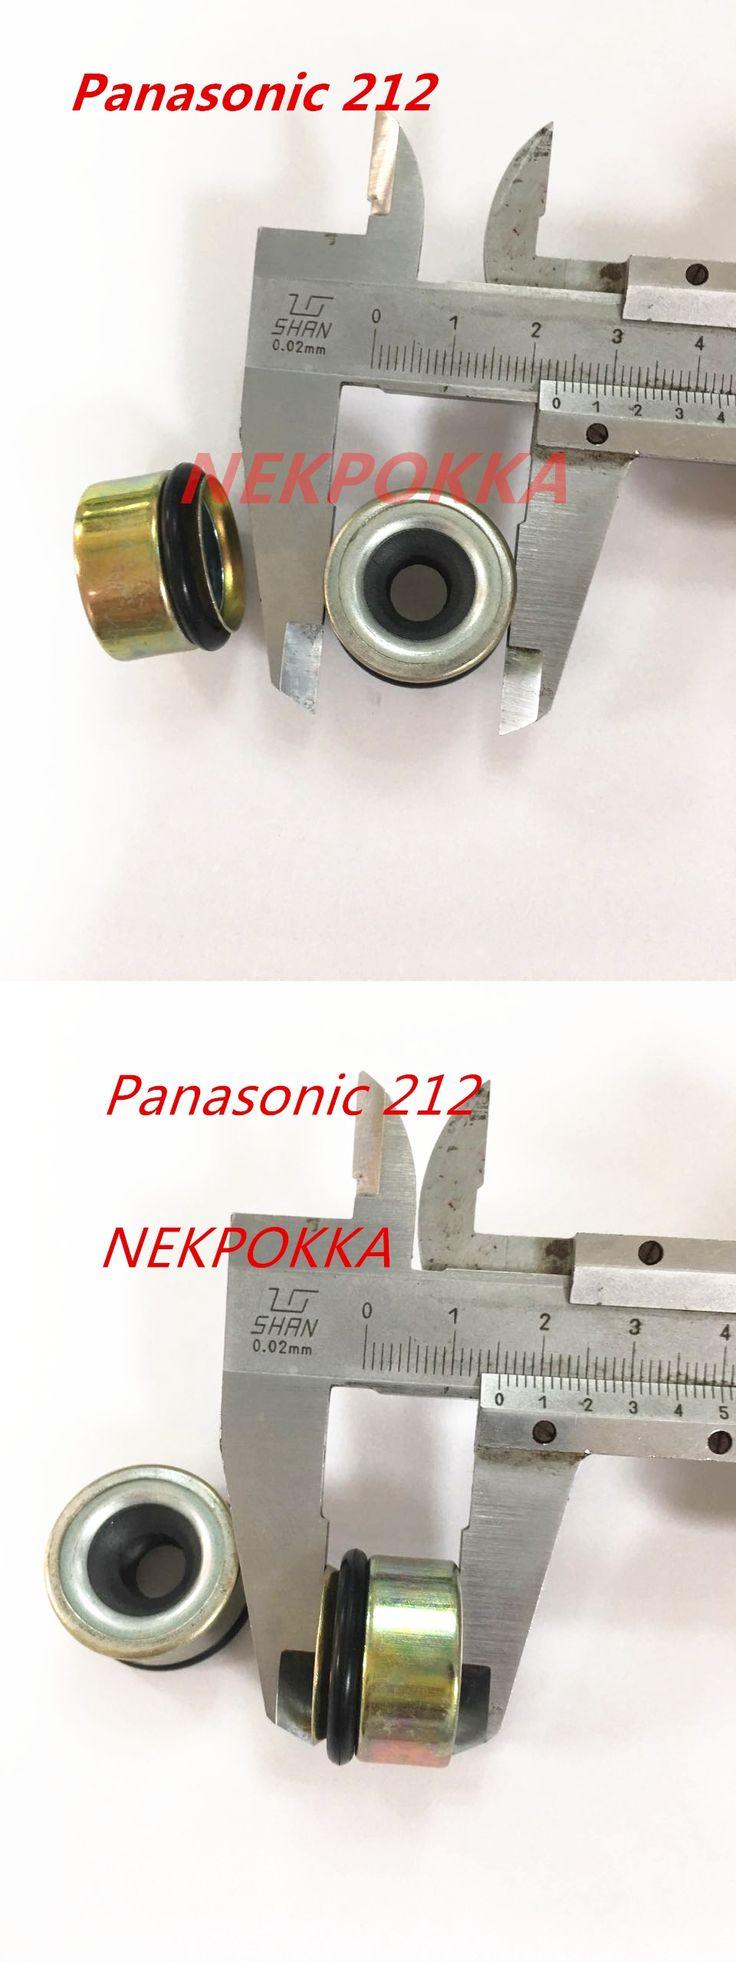 Free Shipping,1piece Automobile air conditioner compressor oil seal,Compressor shaft seal,212 oil seal